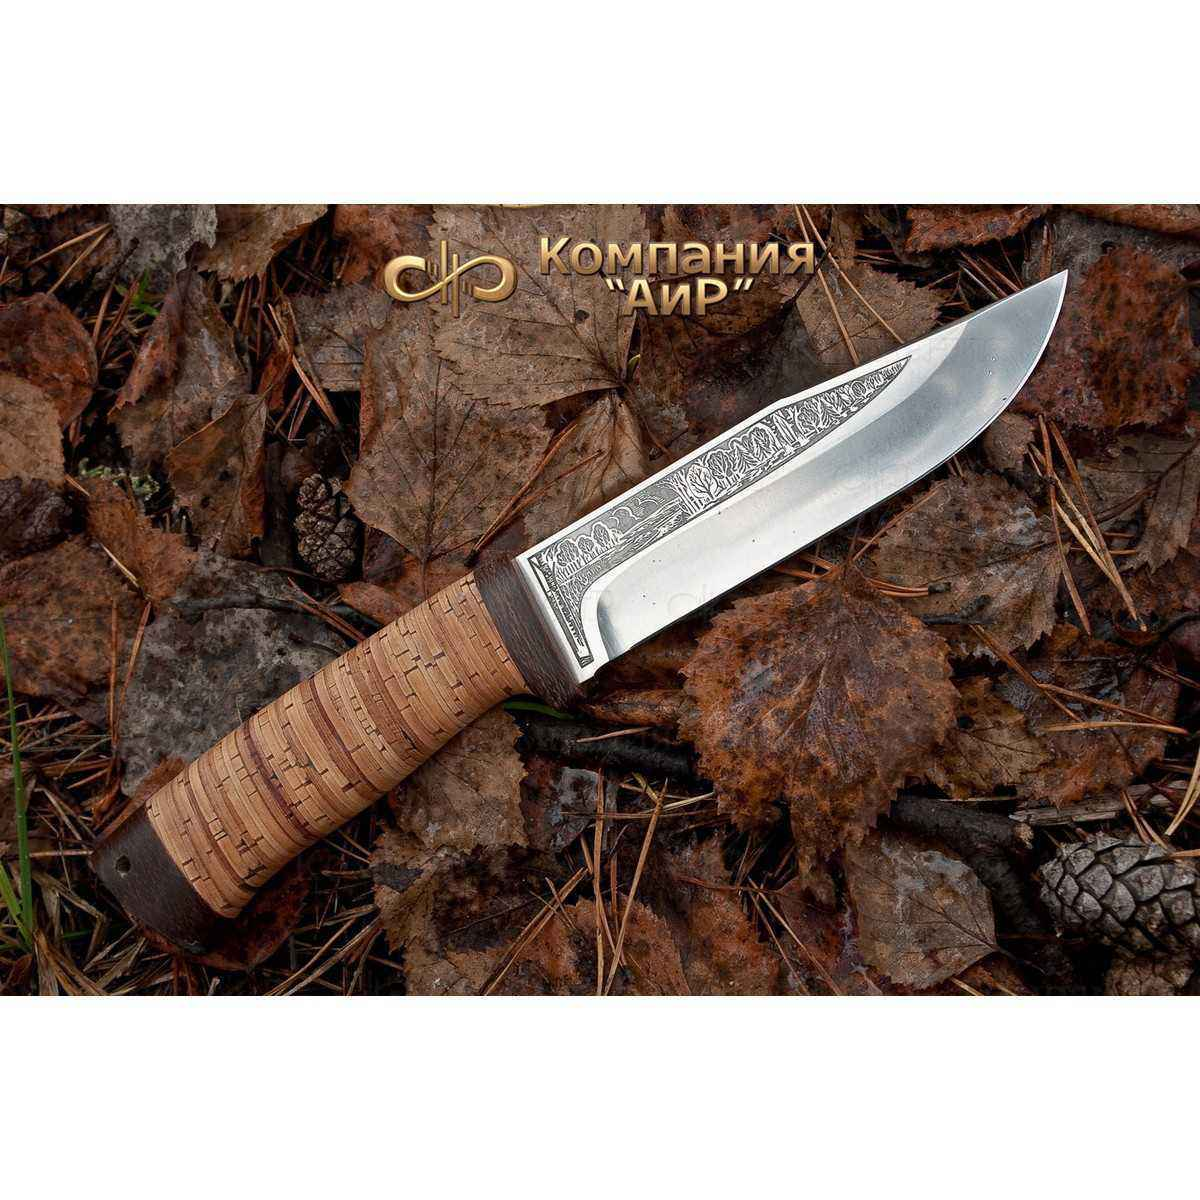 Фото - Нож АиР Турист, сталь 110х18 М-ШД, рукоять береста нож аир хазар сталь 110х18 м шд рукоять кожа